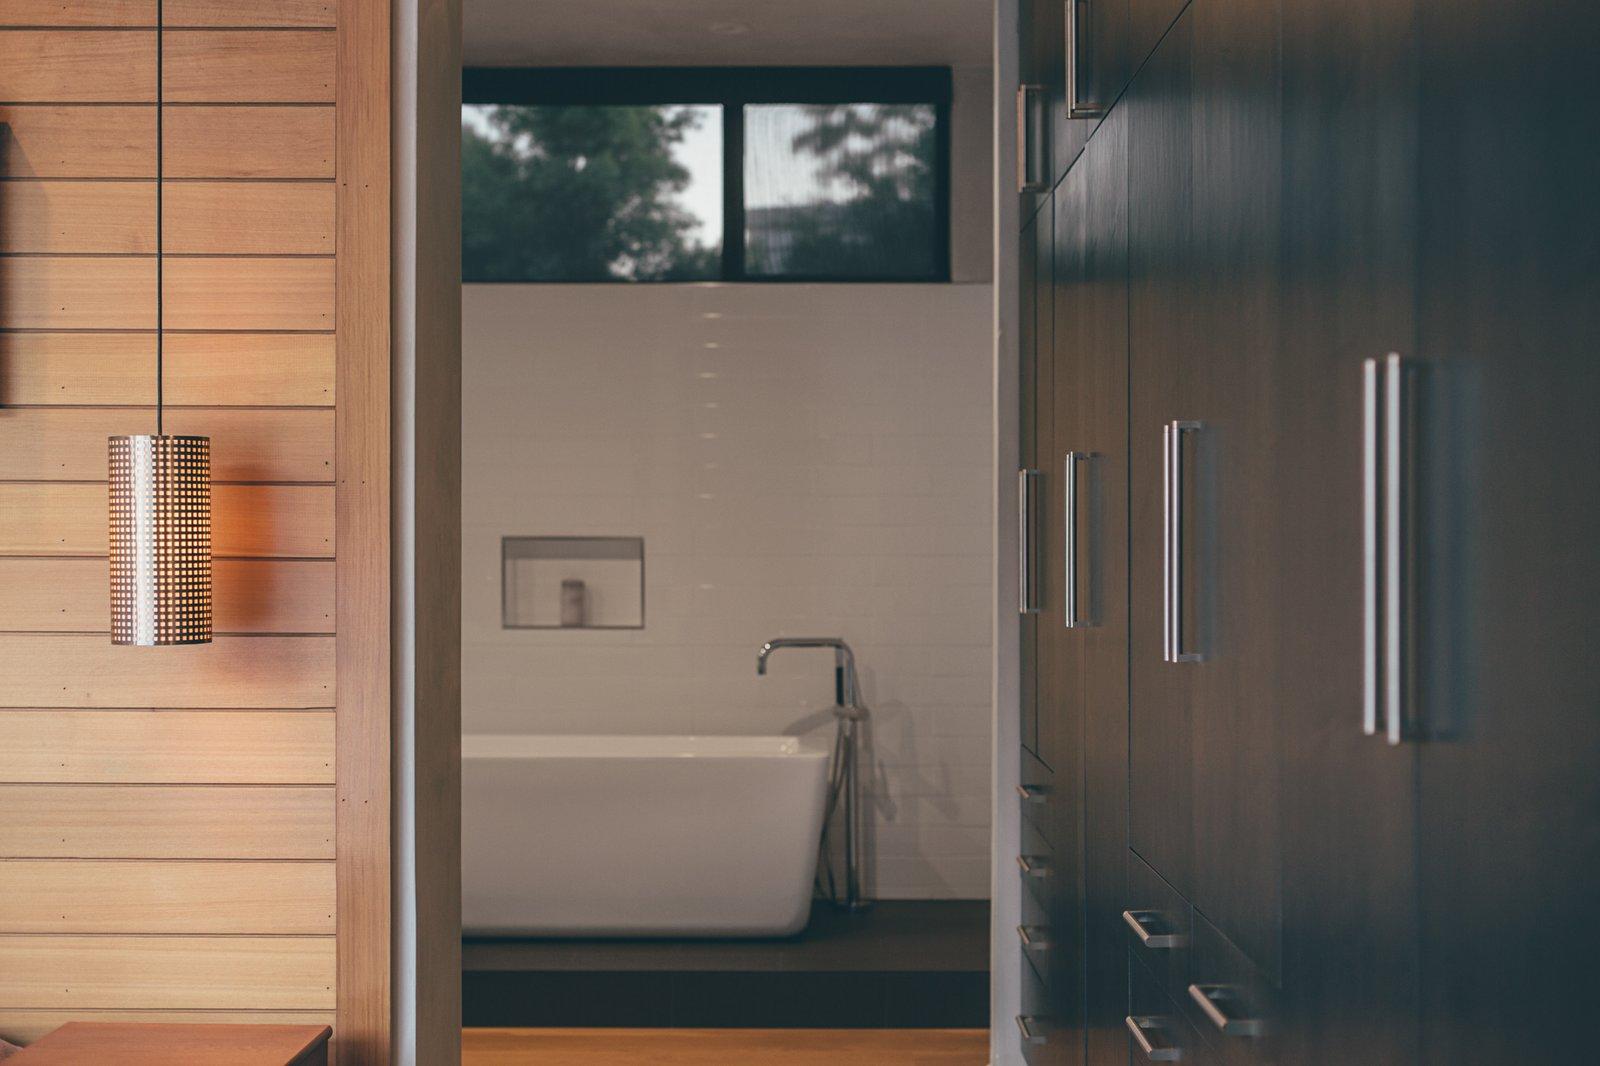 Bath, Freestanding, Soaking, Pendant, and Subway Tile  Best Bath Soaking Pendant Freestanding Photos from Crestline